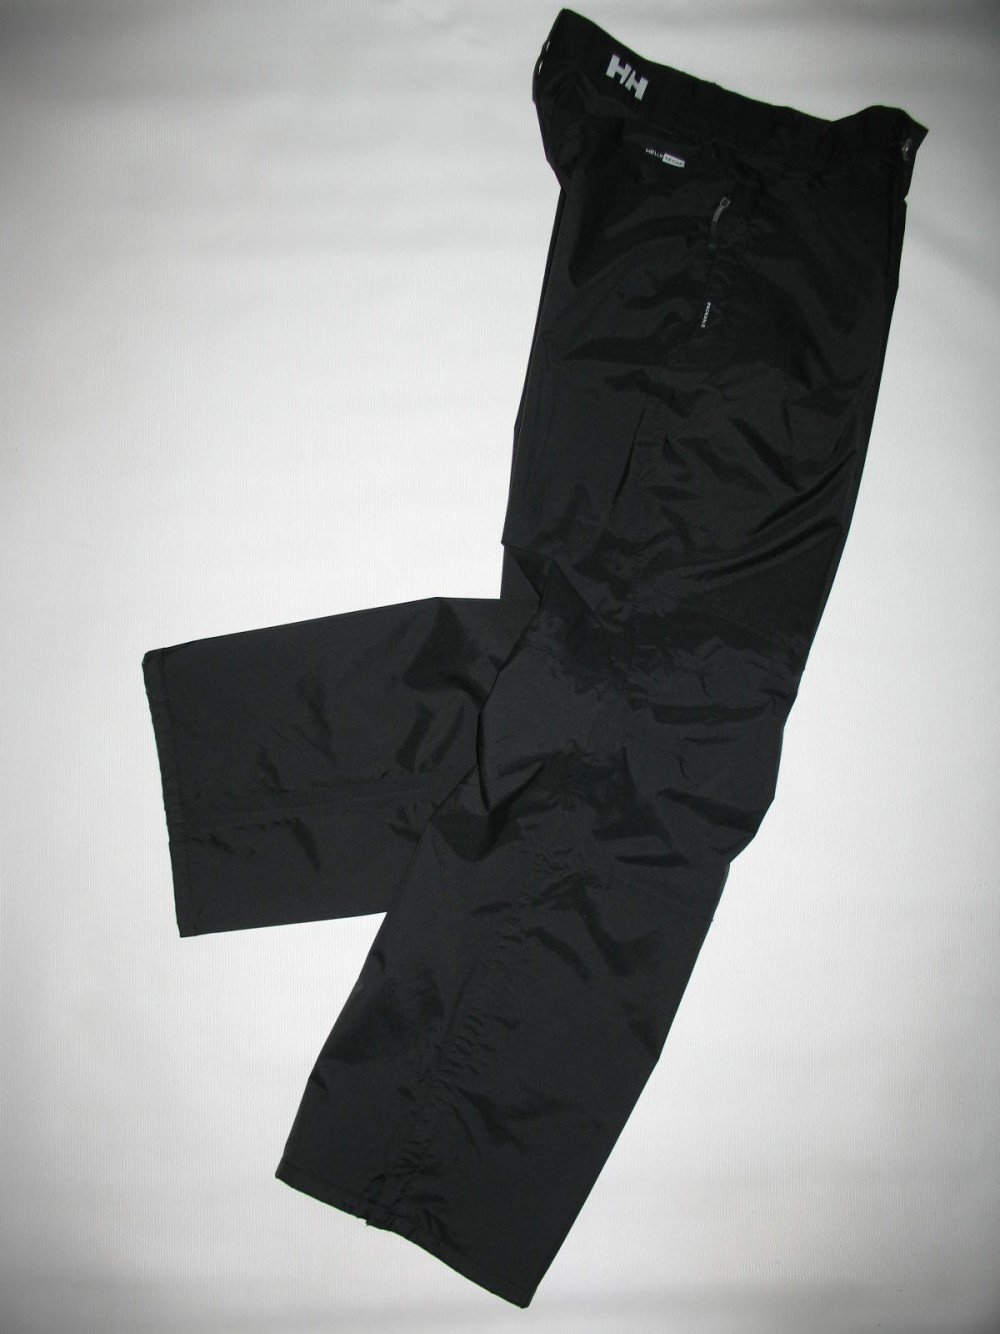 Штаны HELLY HANSEN hellytech packable pants lady (размер XS) - 2